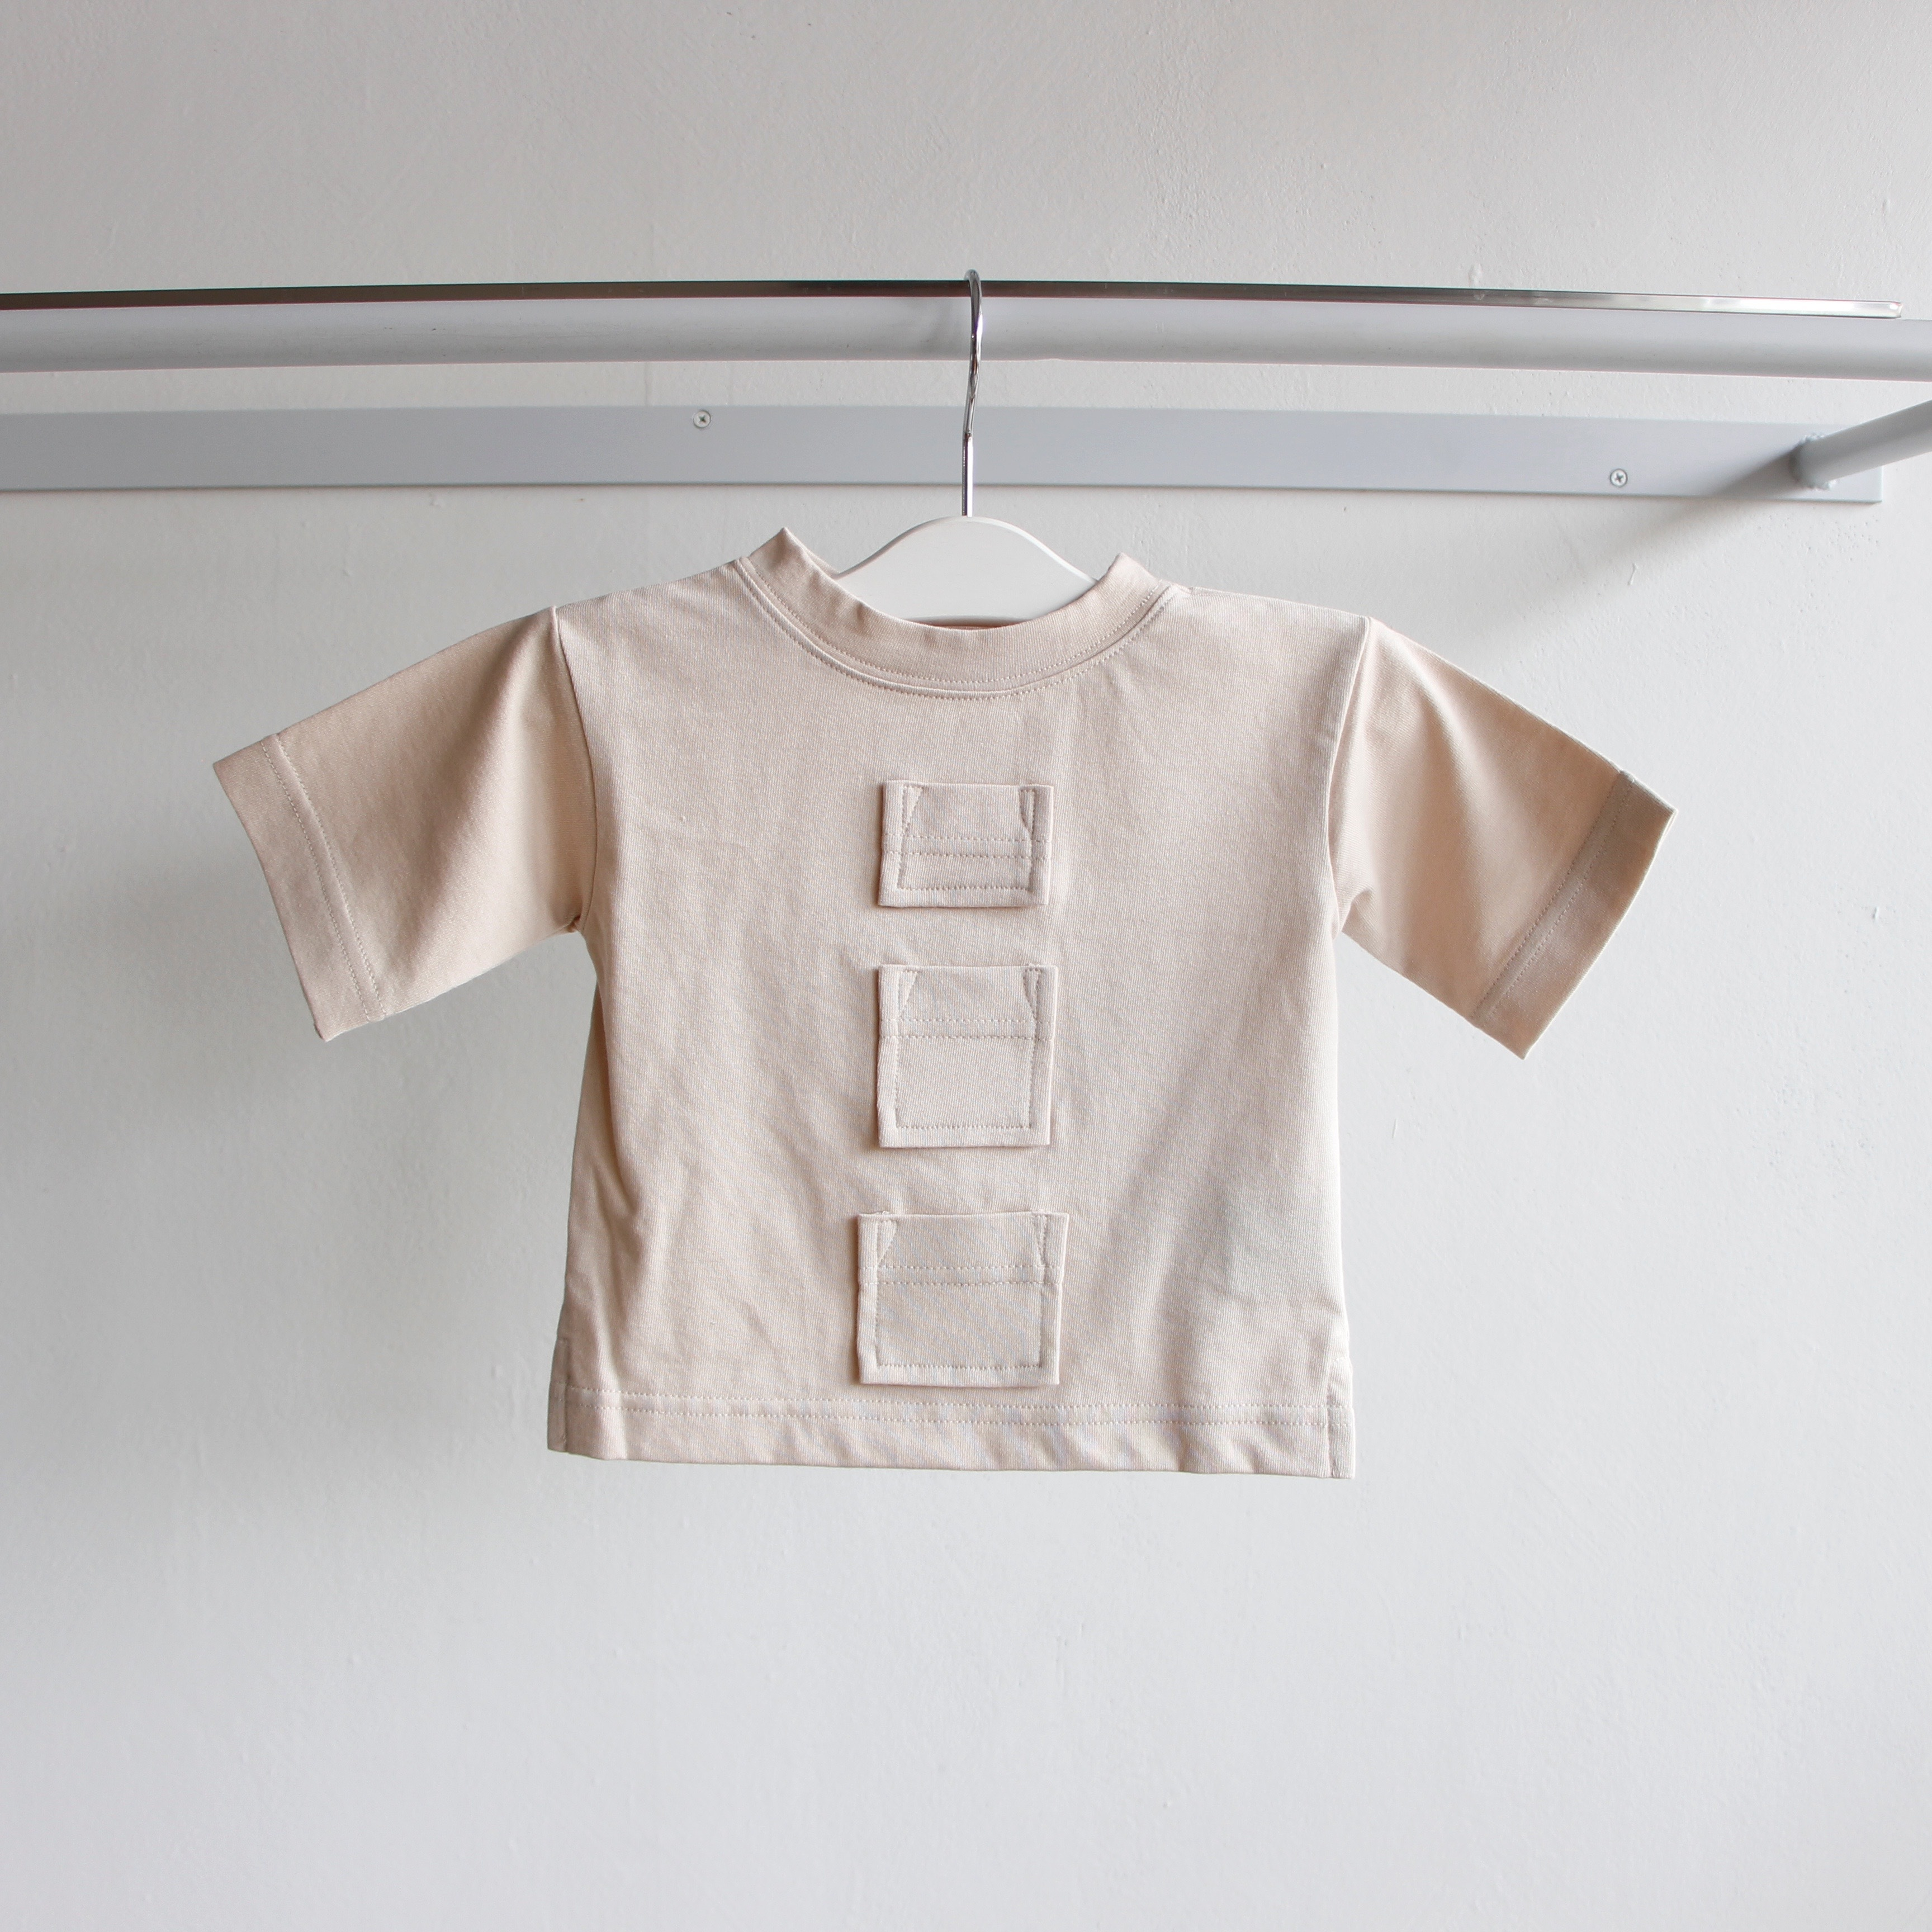 《UNIONINI 2019SS》many pockets tee / beige